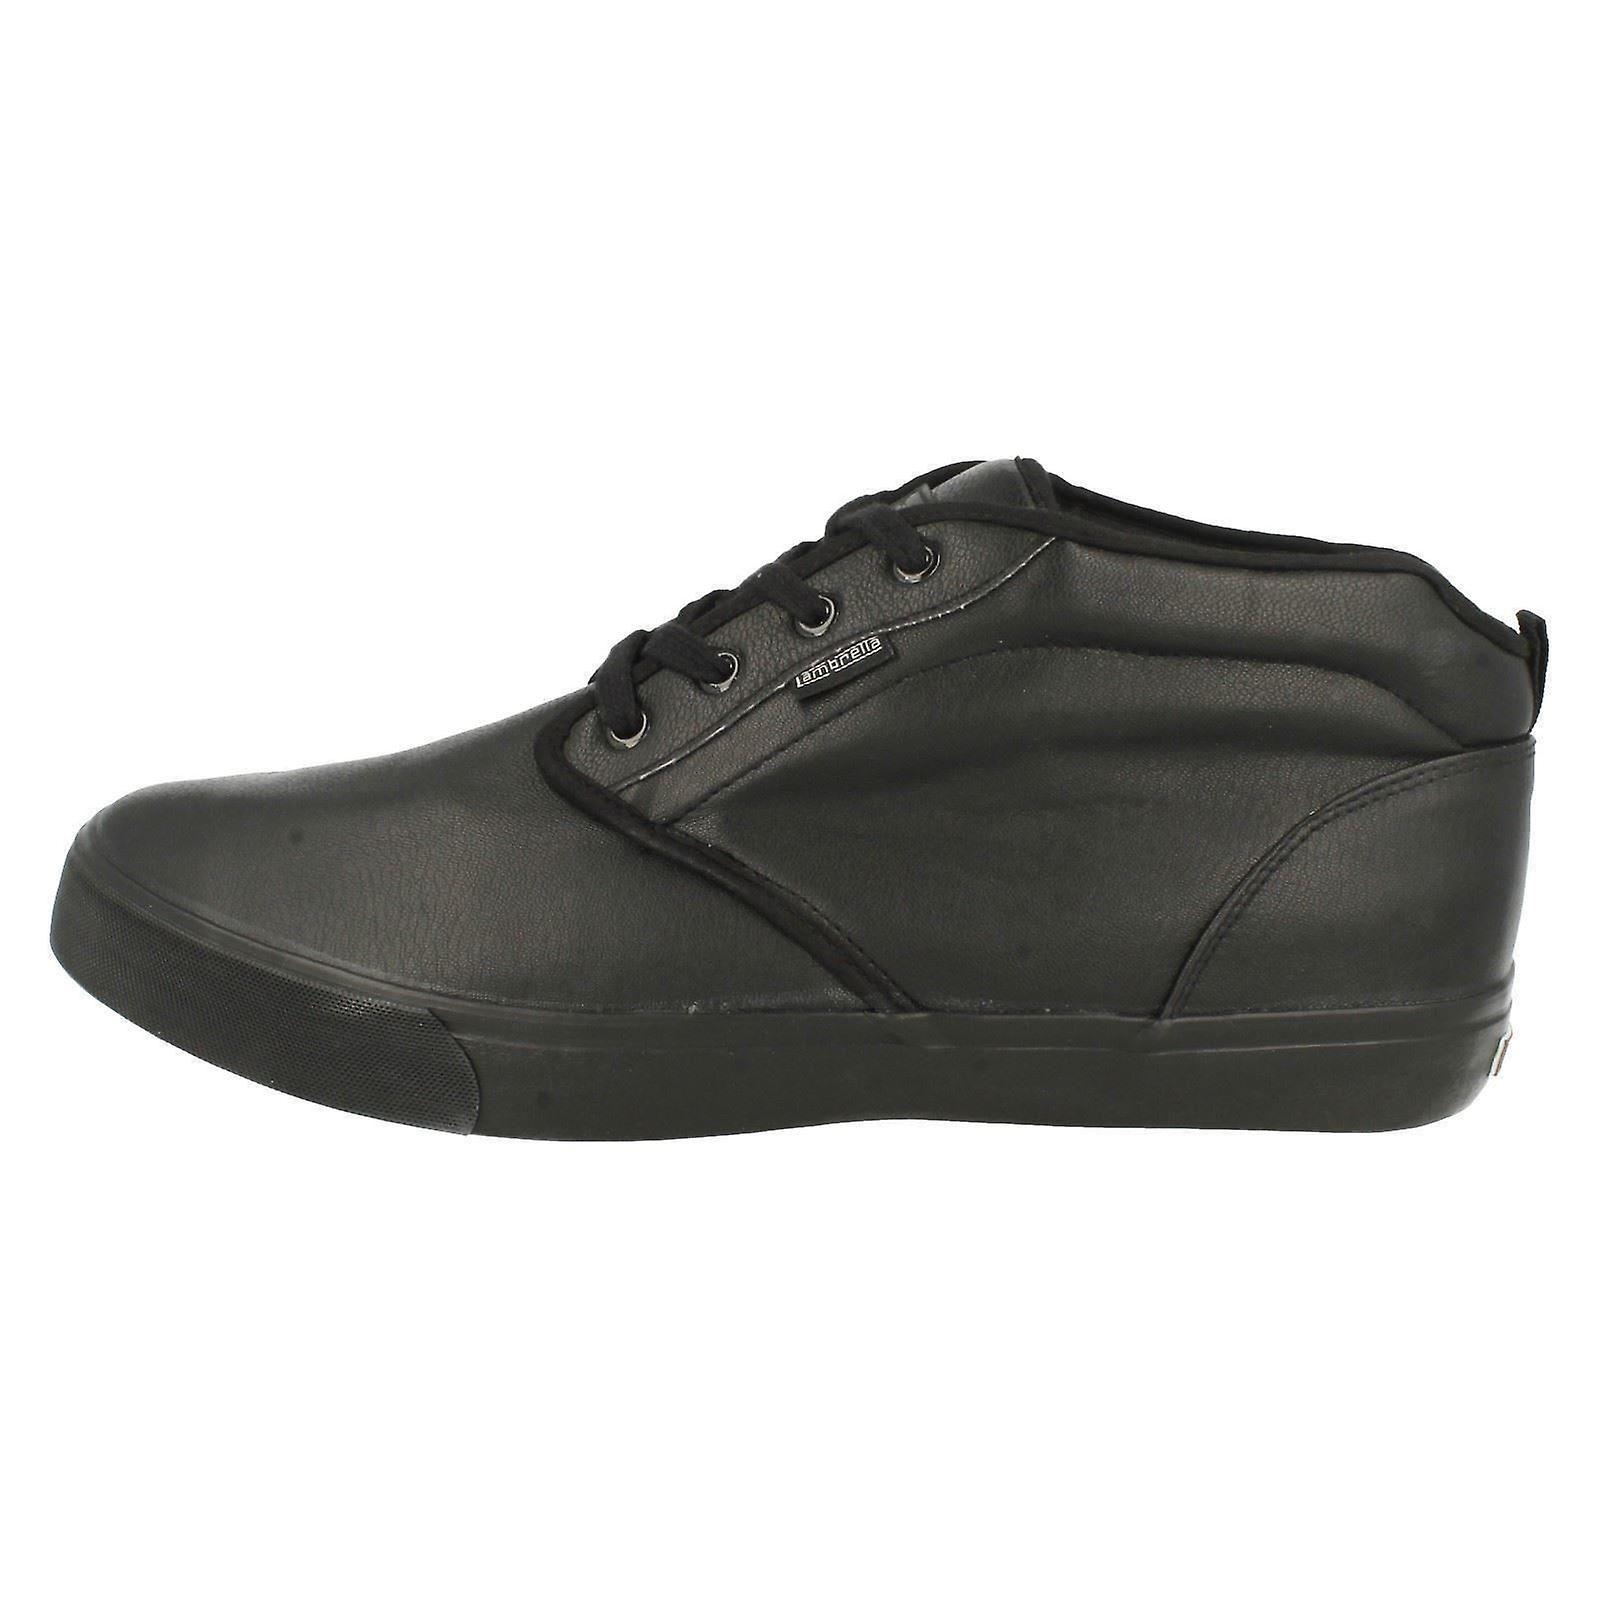 Mens Lambretta Ankle Boots *Buzz*